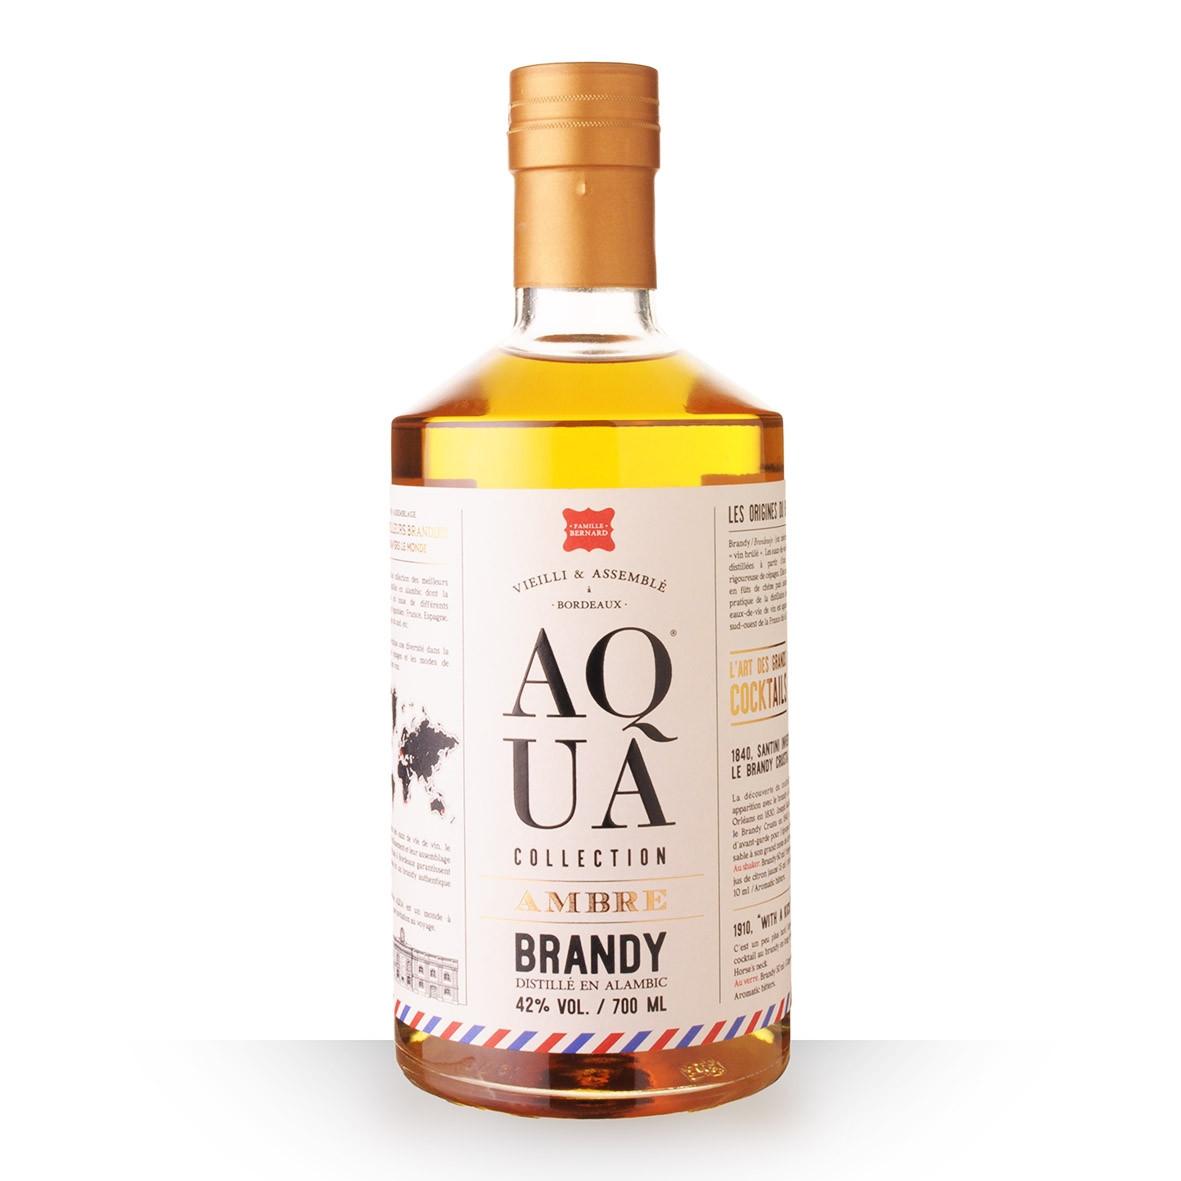 Eau-de-vie de vin Aqua Brandy 70cl www.odyssee-vins.com